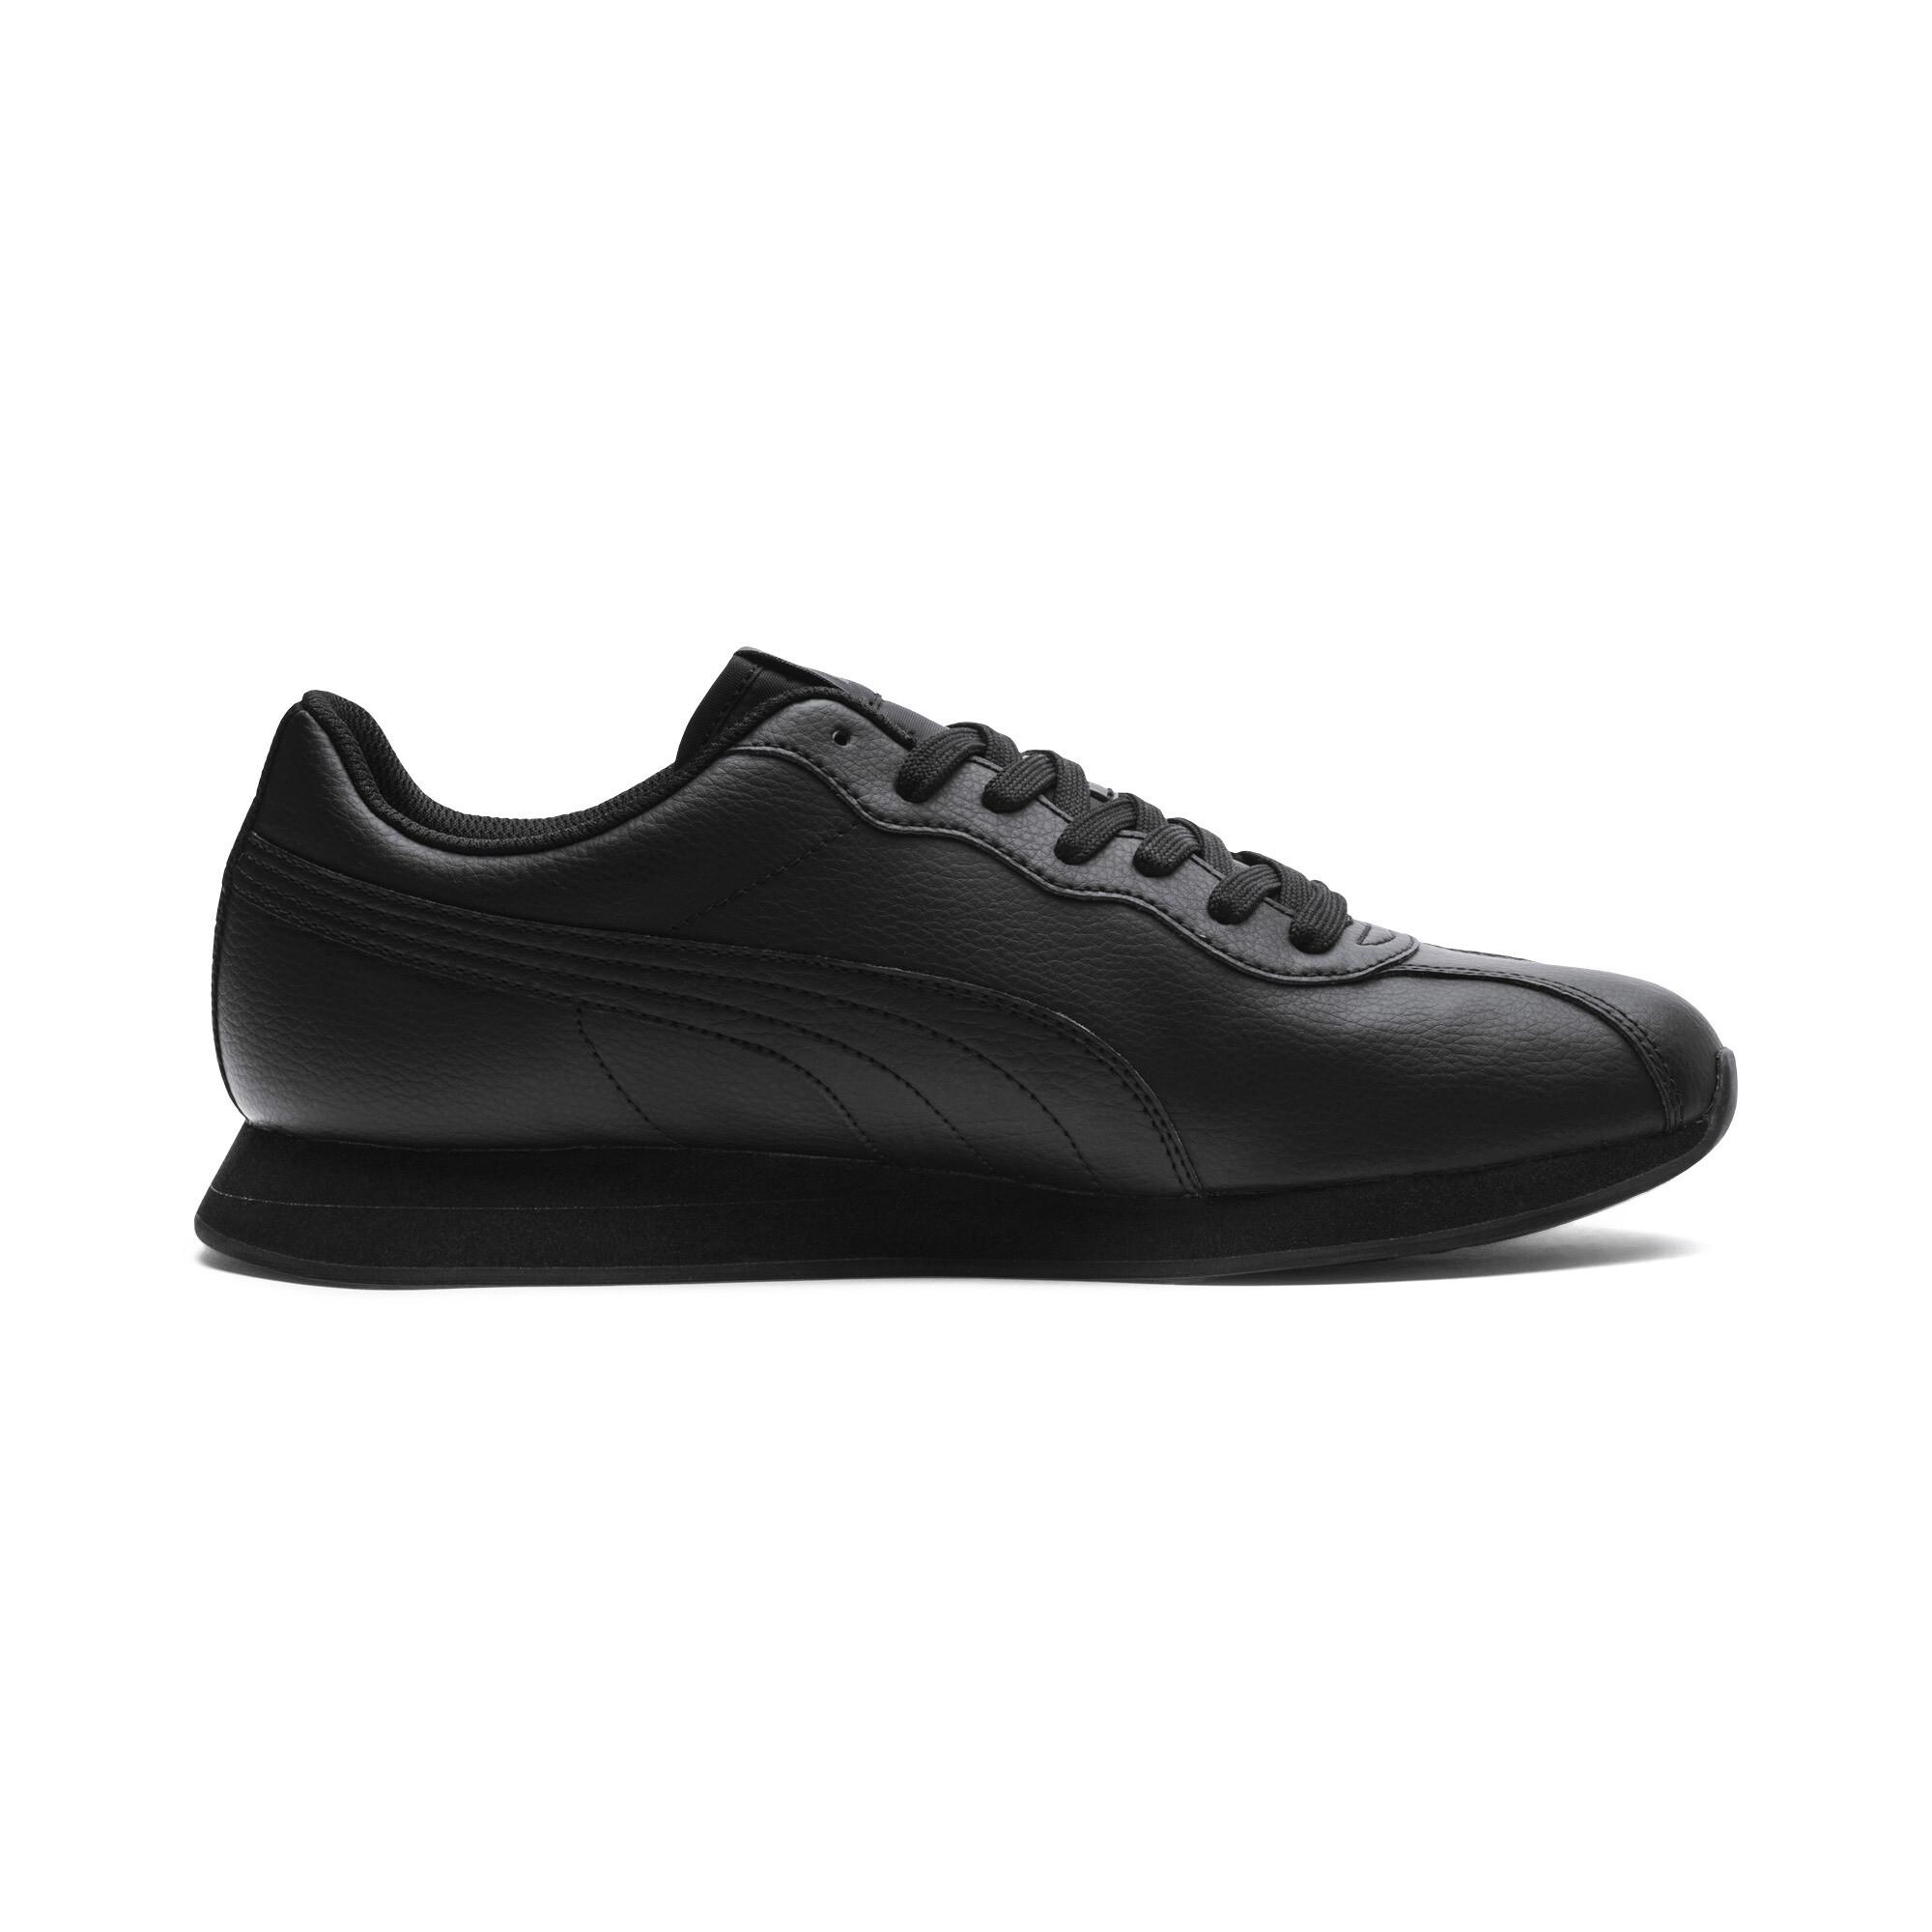 thumbnail 7 - PUMA Men's Turin II Sneakers